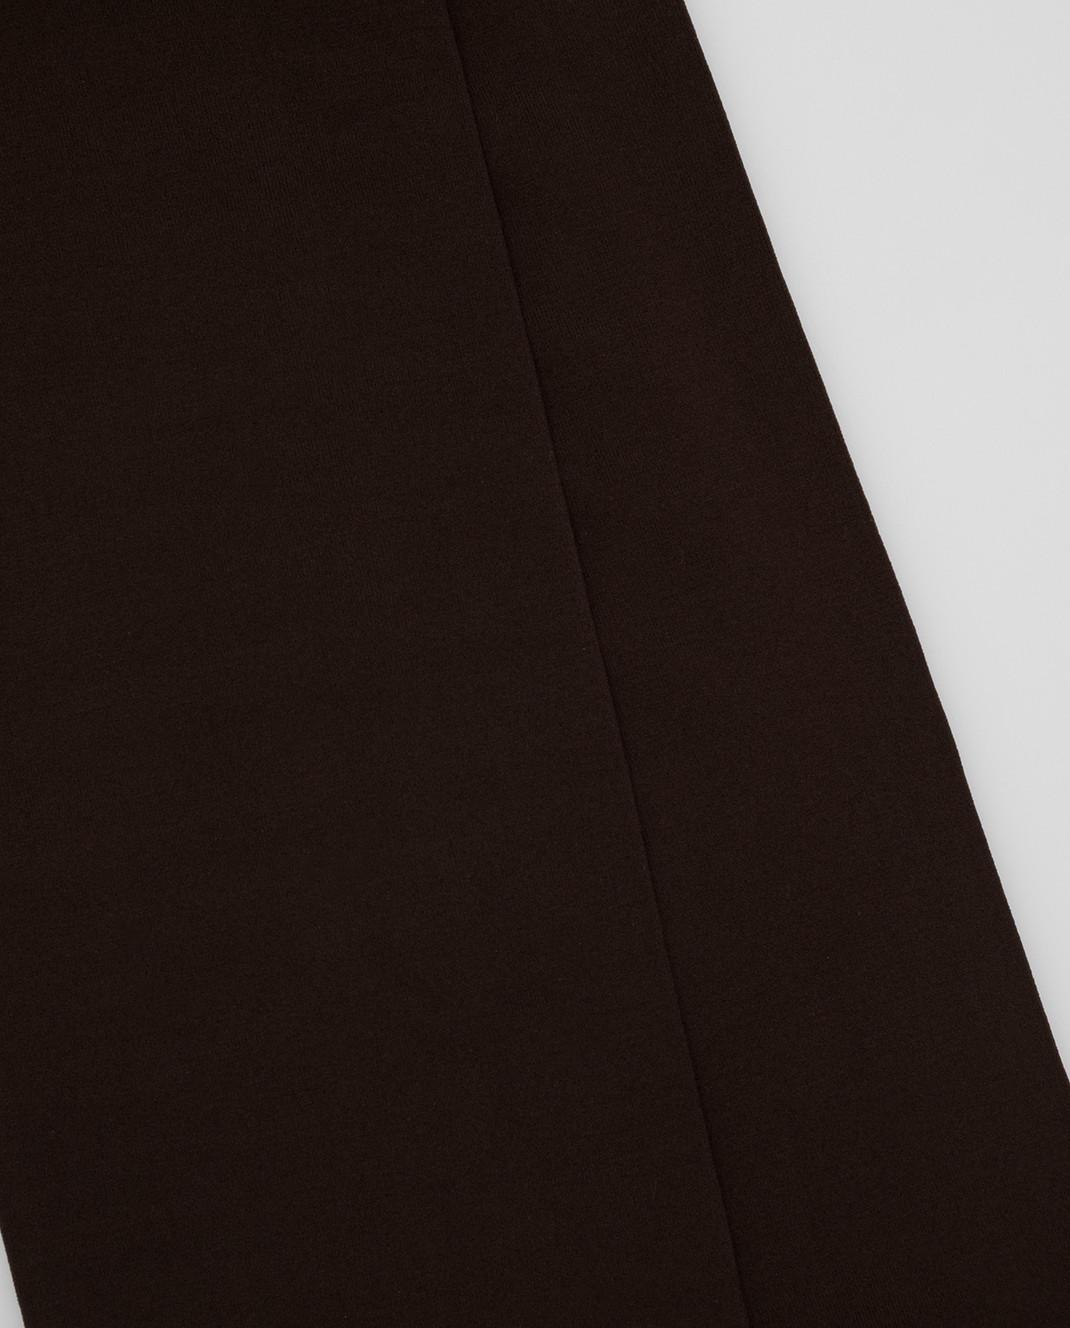 Max Mara Темно-коричневые колготы 50 ден LISBONA изображение 3